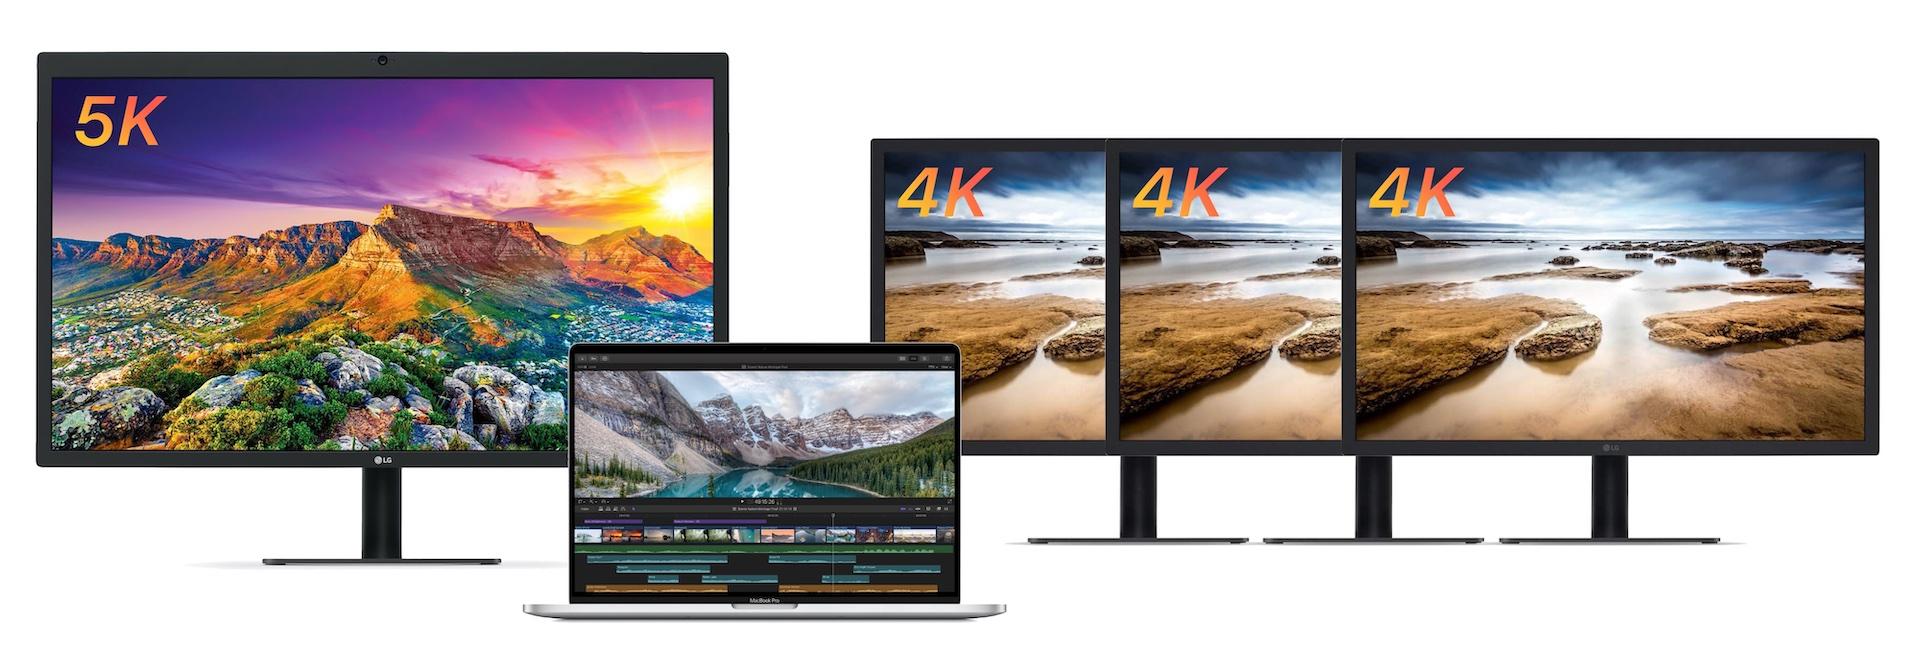 MacBook Pro (16-inch, 2019)に接続された5K1台と4K3台